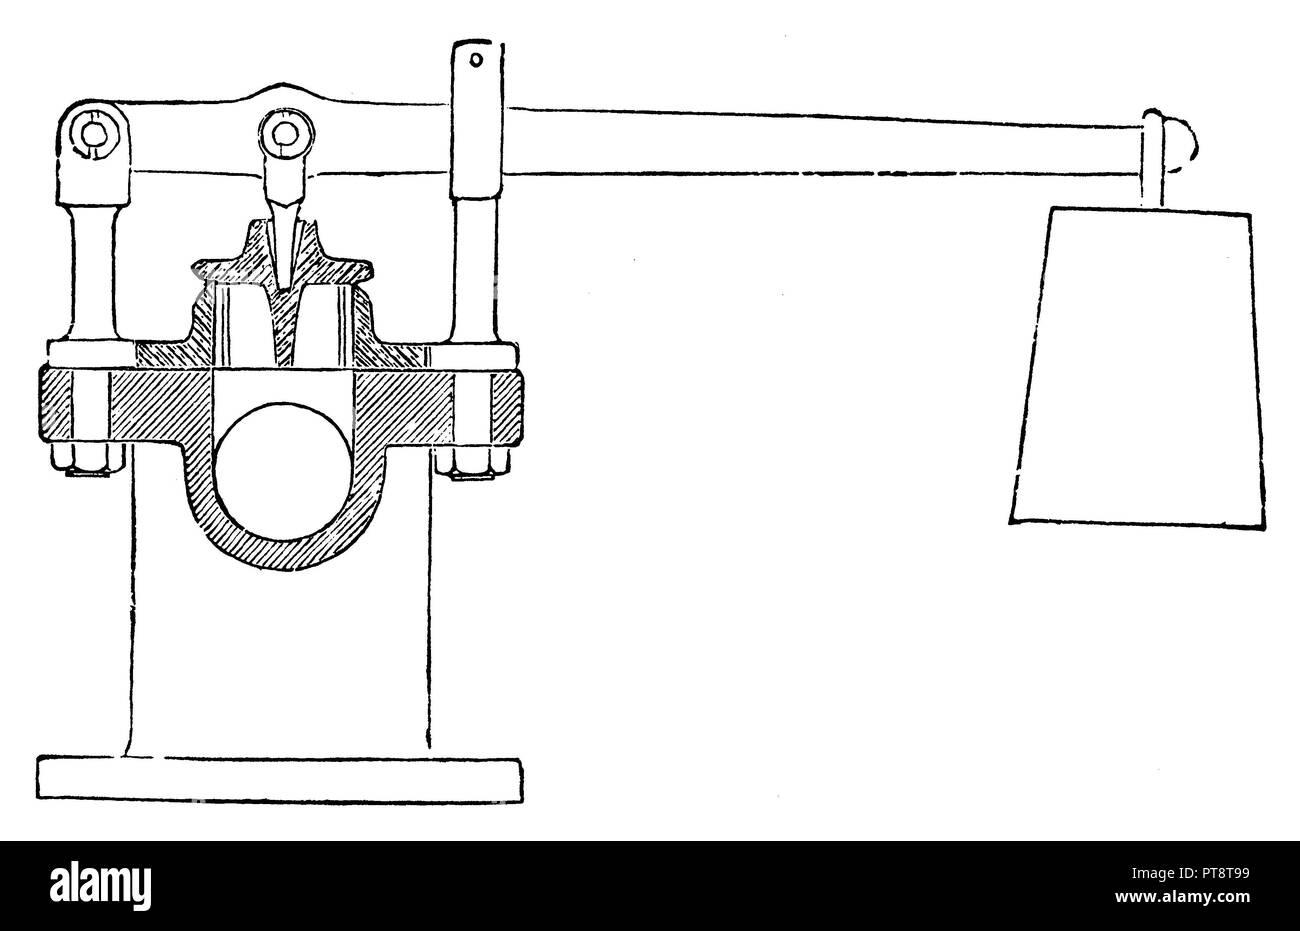 hight resolution of safety valve 1900